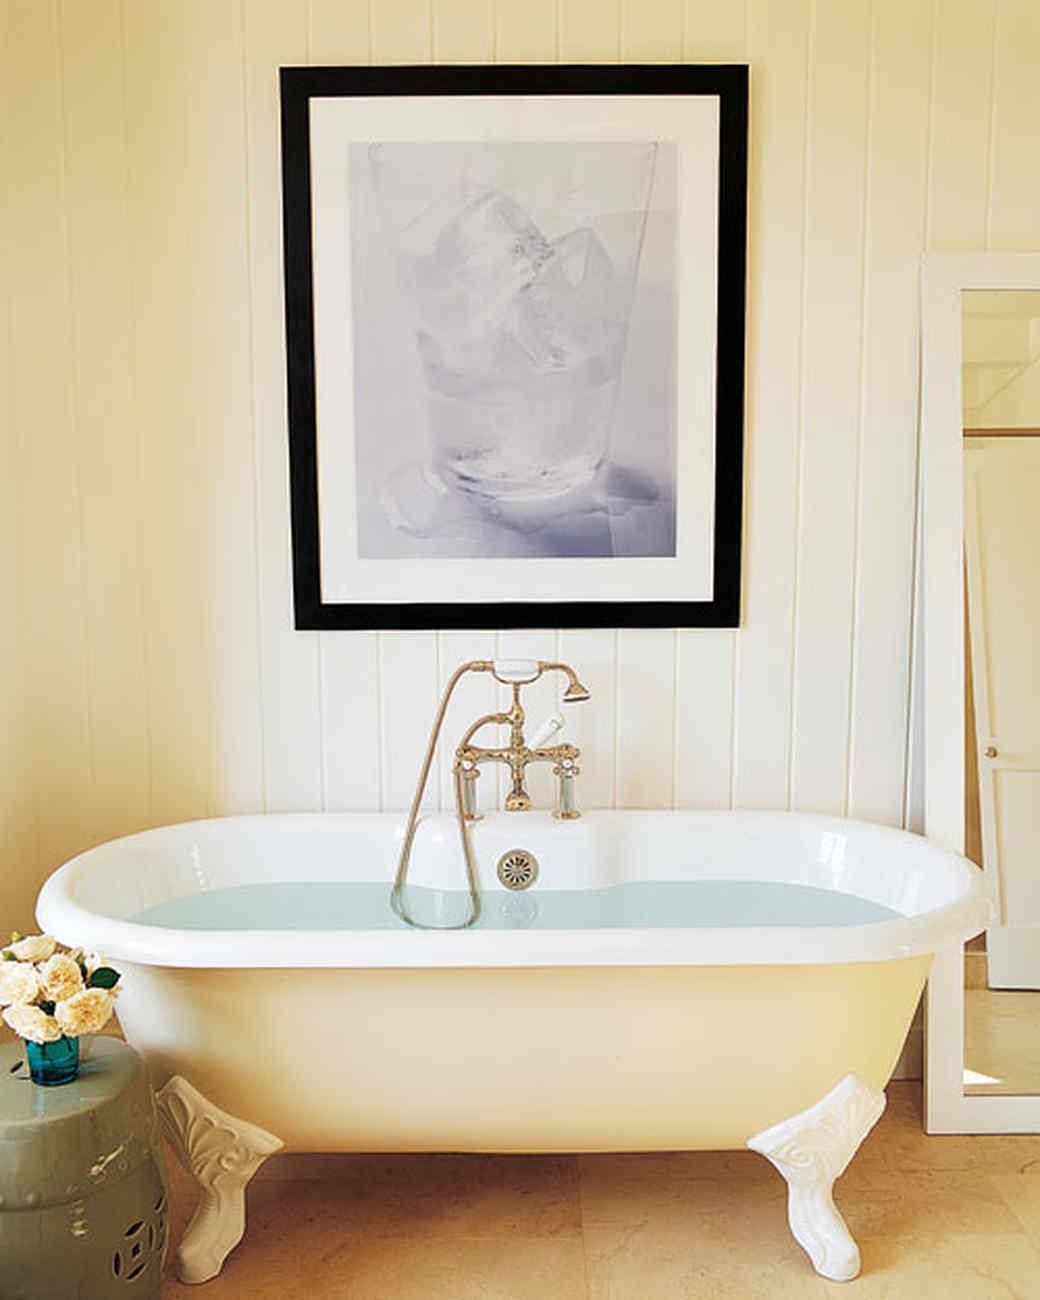 mla101559_sept2005_bathtub.jpg